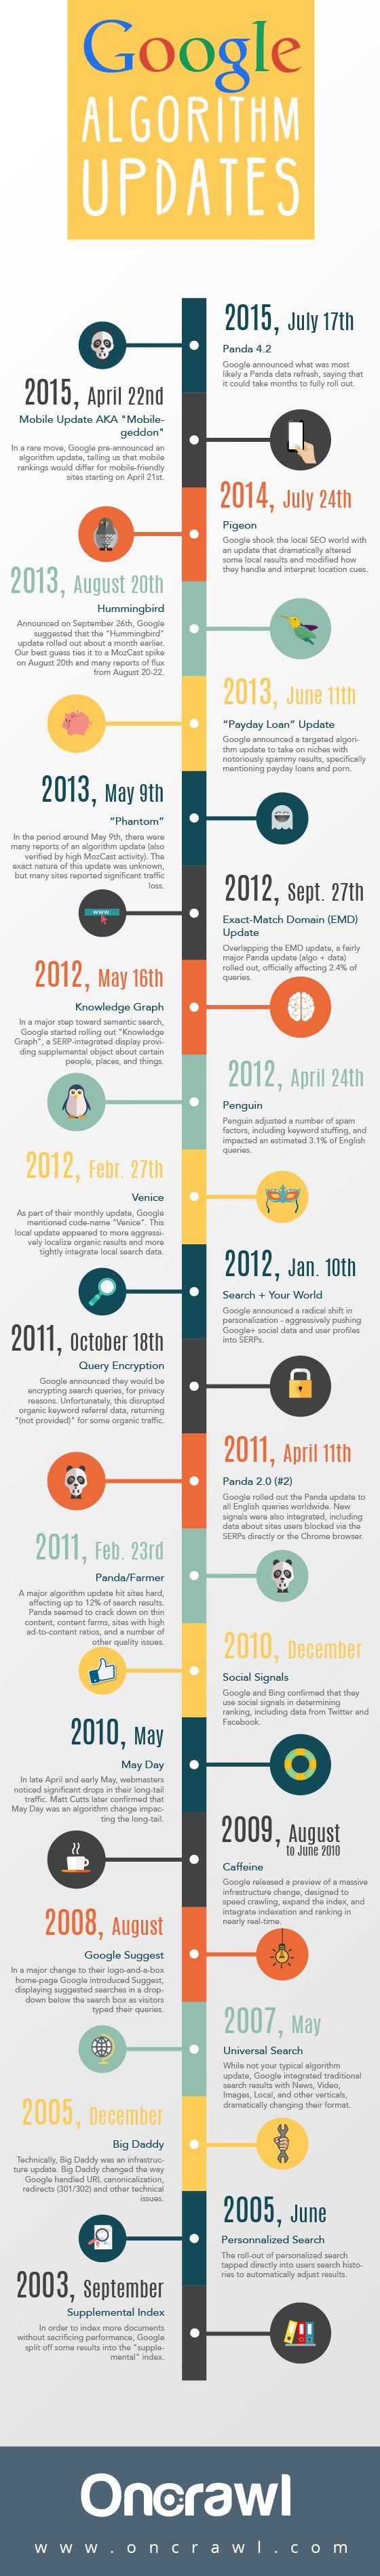 Google Algorithm Updates - 2003 to 2015